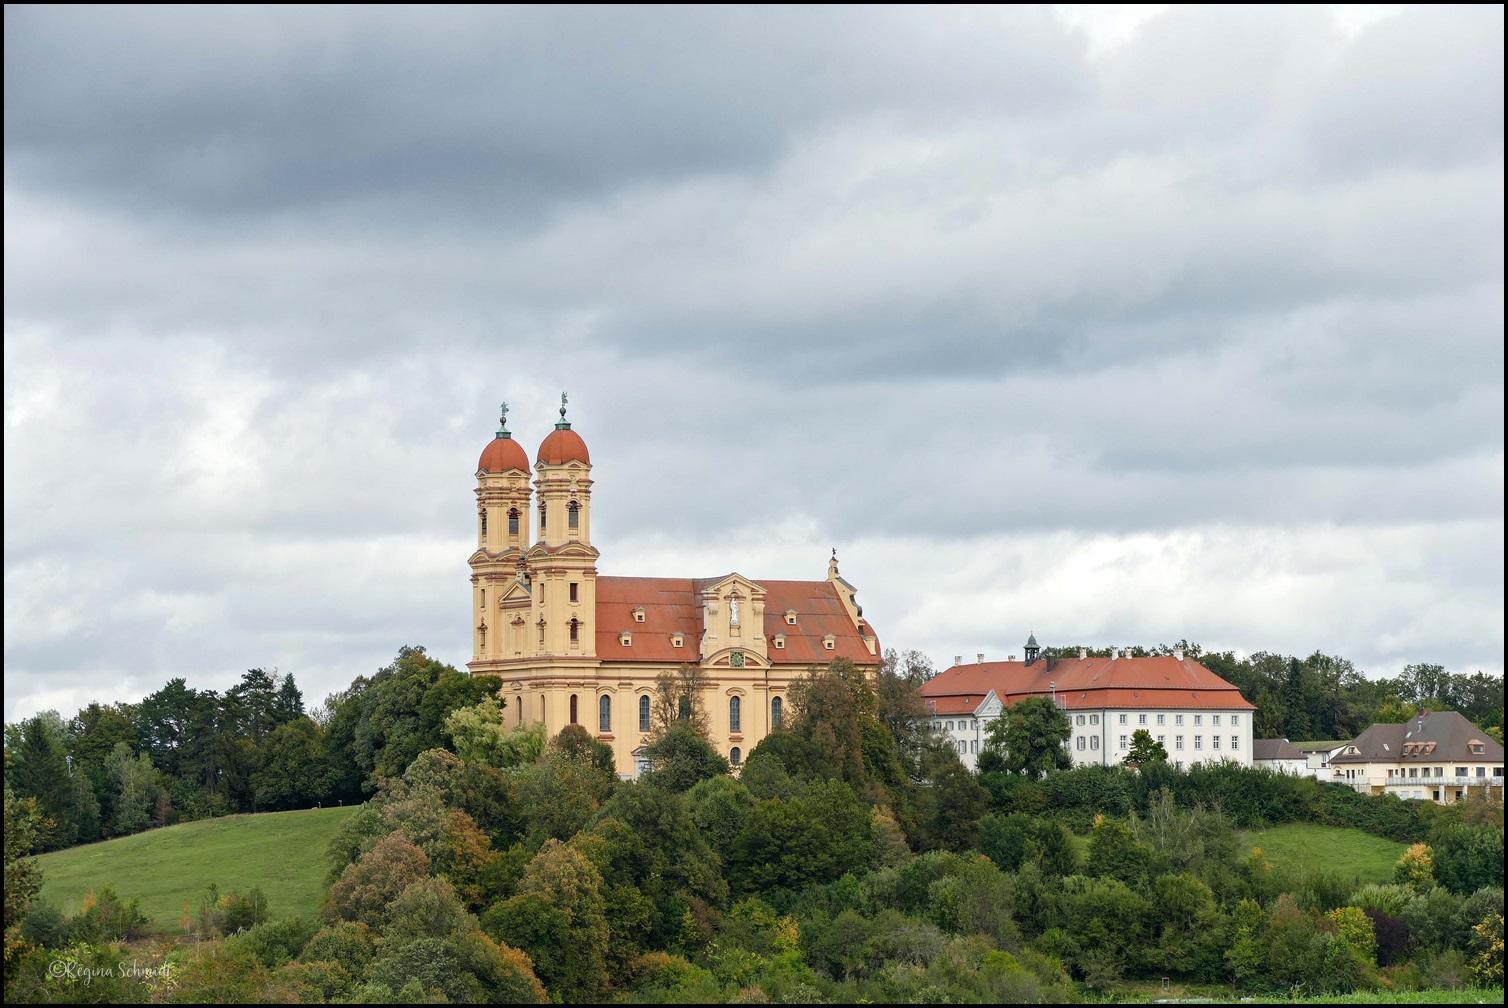 Wallfahrtskirche am Schönenberg.